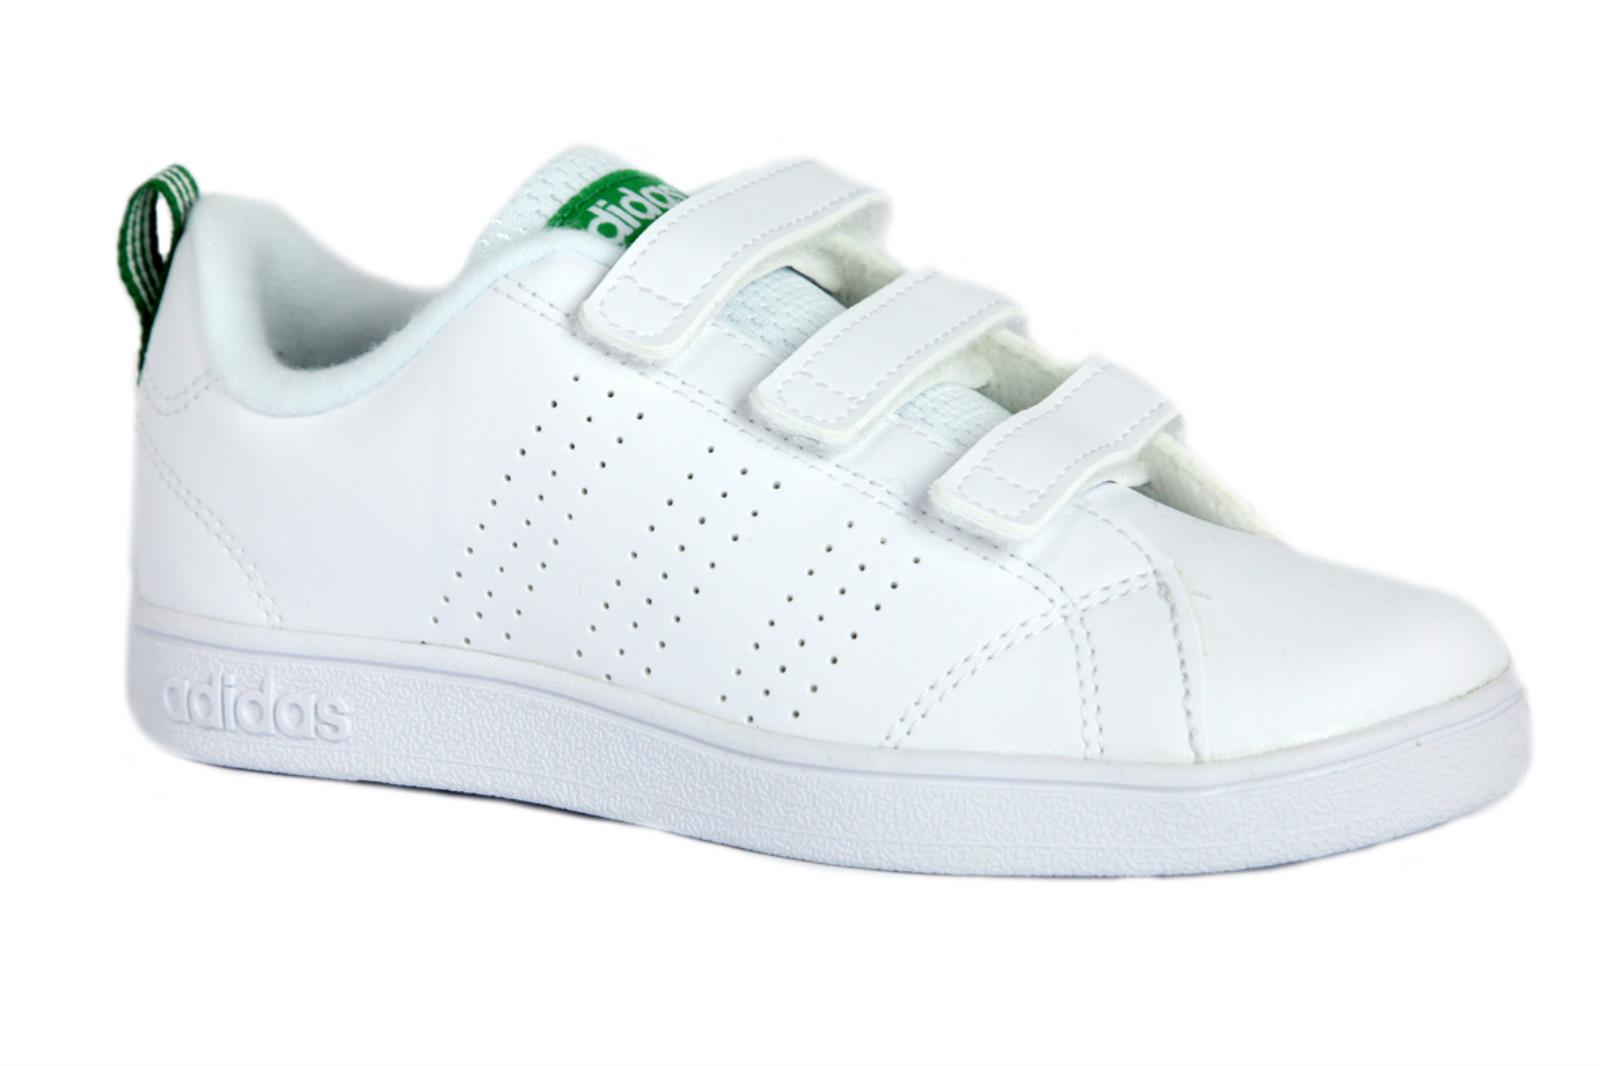 Scarpe Bambino adidas Kid Aw4880 Primavera estate Bianco 30  97ae646d124